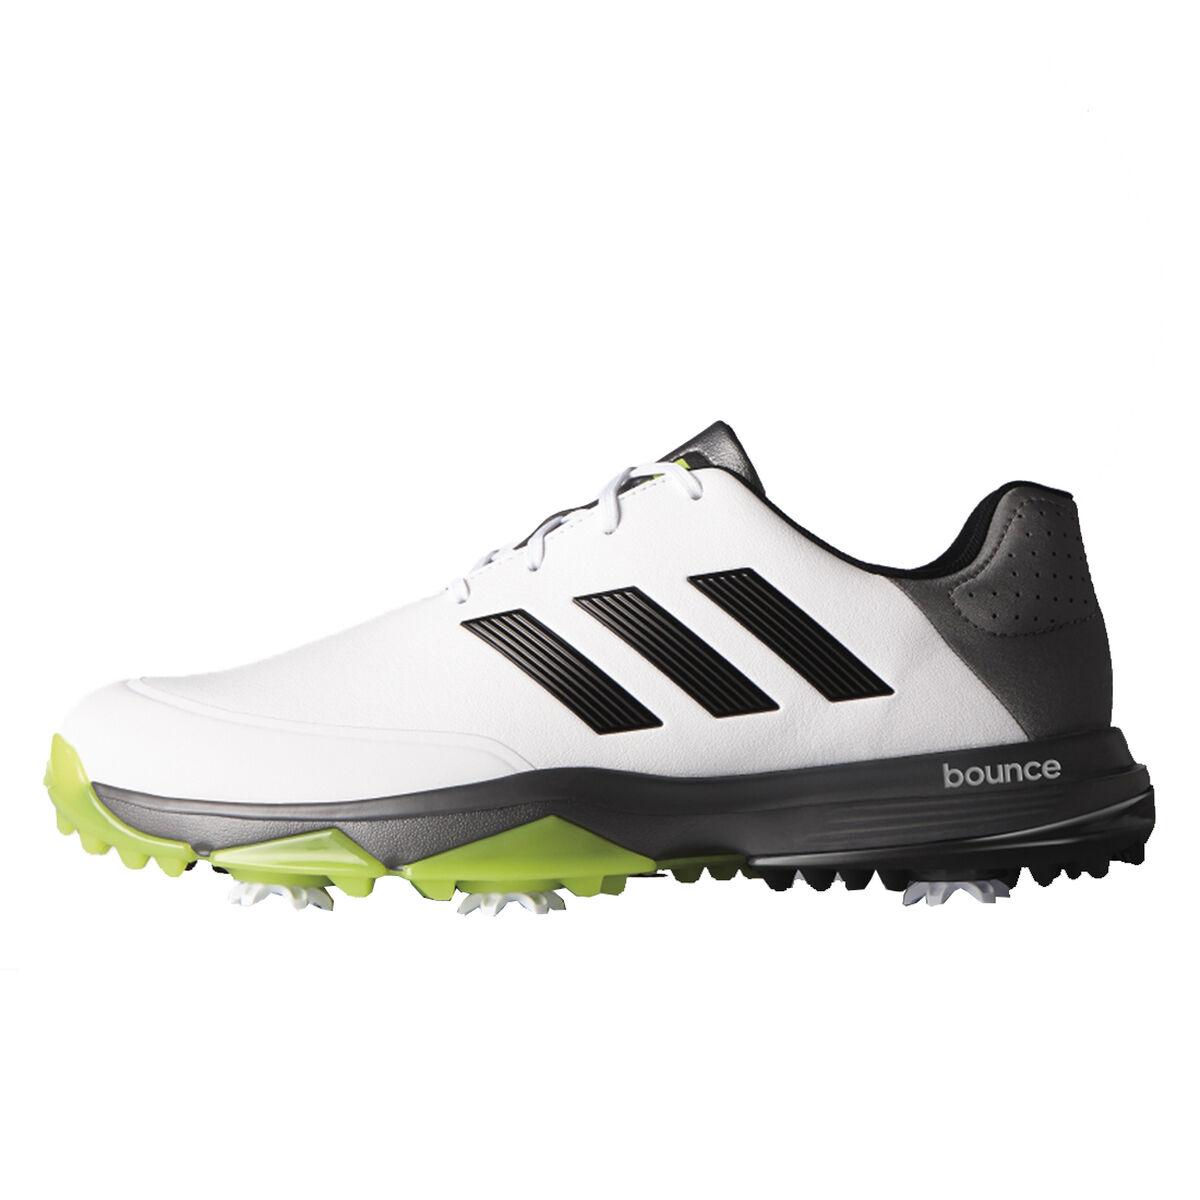 2dde076d67771 Images. Adipower Bounce Men  39 s Golf Shoe ...